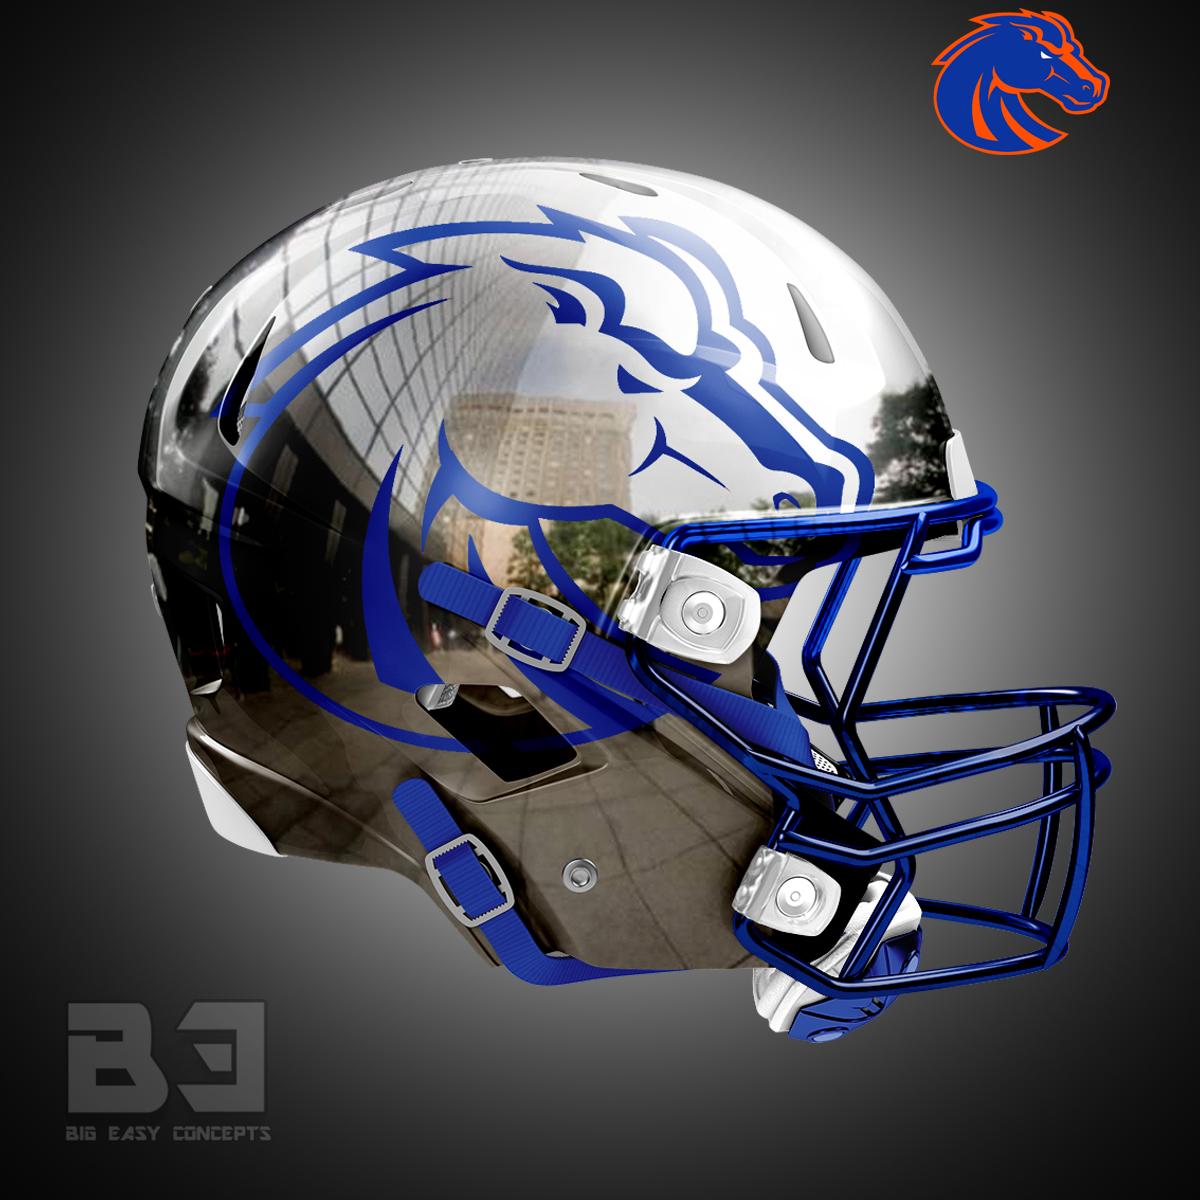 Big Easy s Concept Helmet Thread - Page 3 - Concepts - Chris ... 7222f9cf0